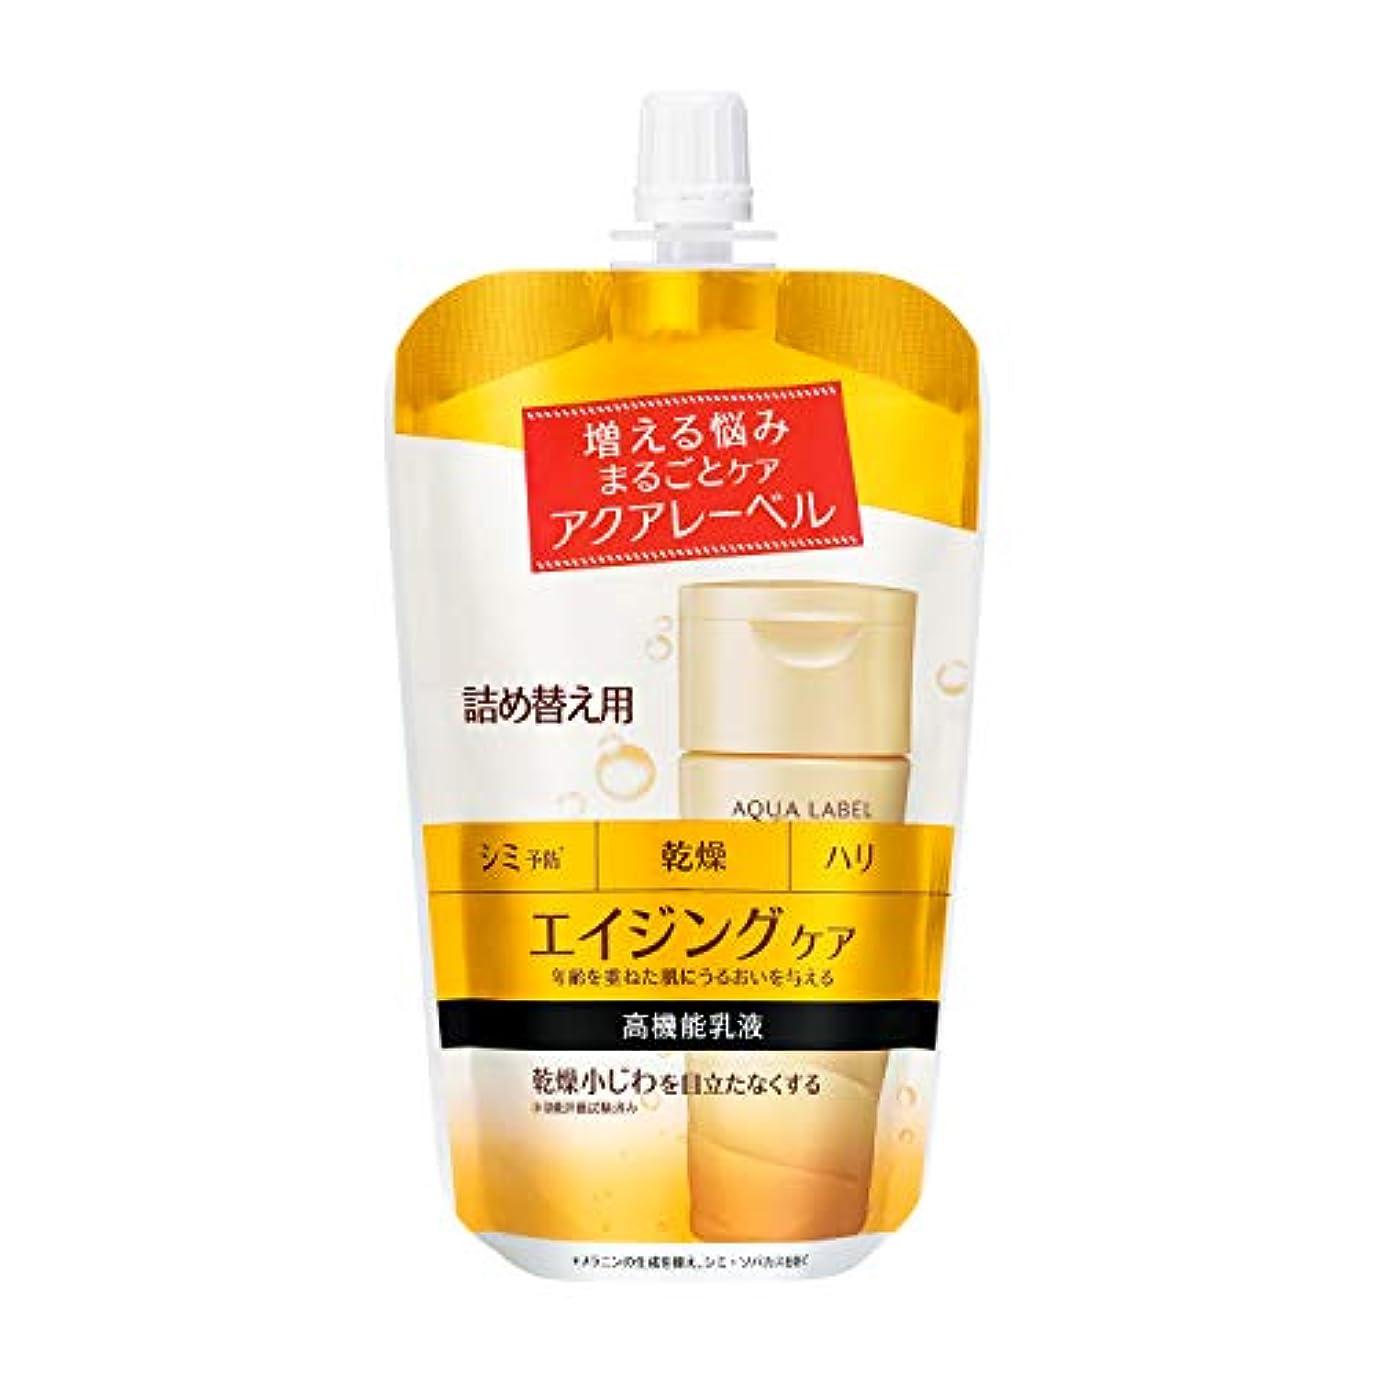 AQUALABEL(アクアレーベル) バウンシングケア ミルク (詰め替え用) 【医薬部外品】 117mL